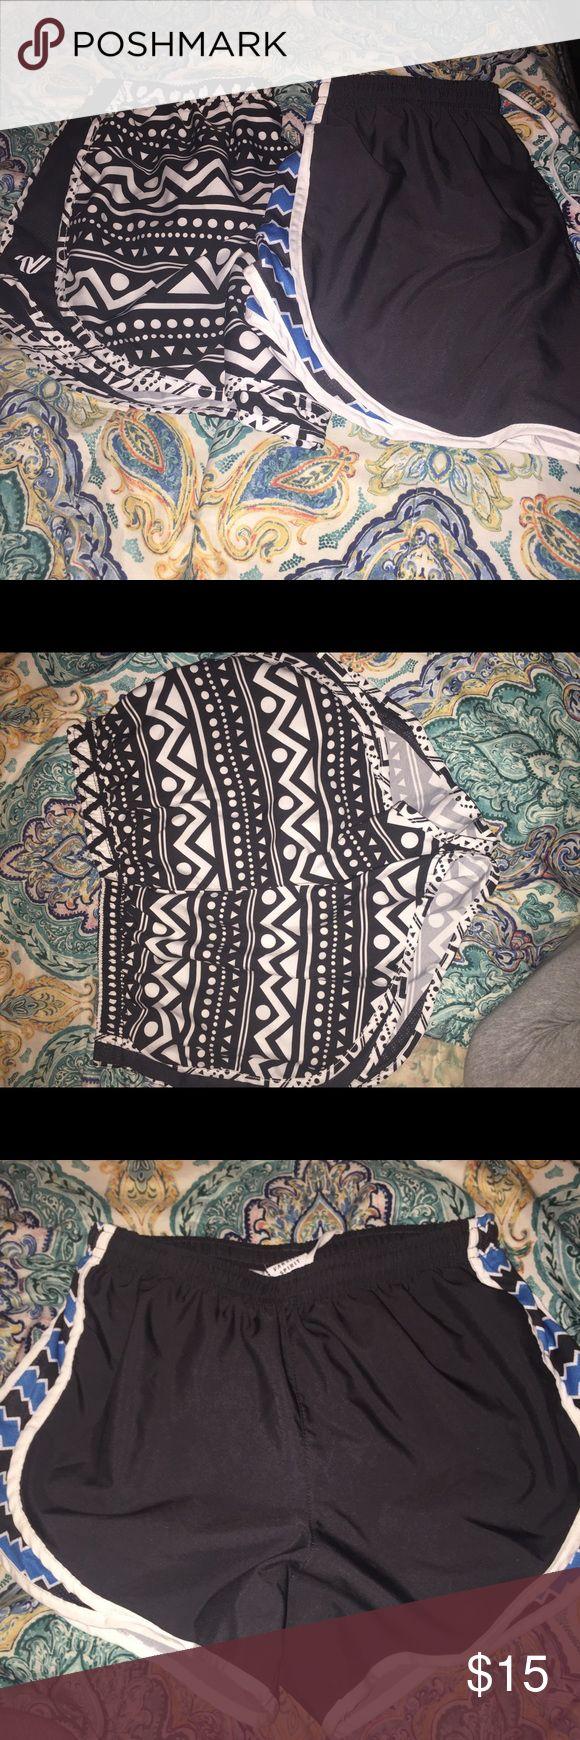 VARSITY CHEER SHORTS SM Very cute and brand new. Never worn. NOT NIKE Nike Shorts